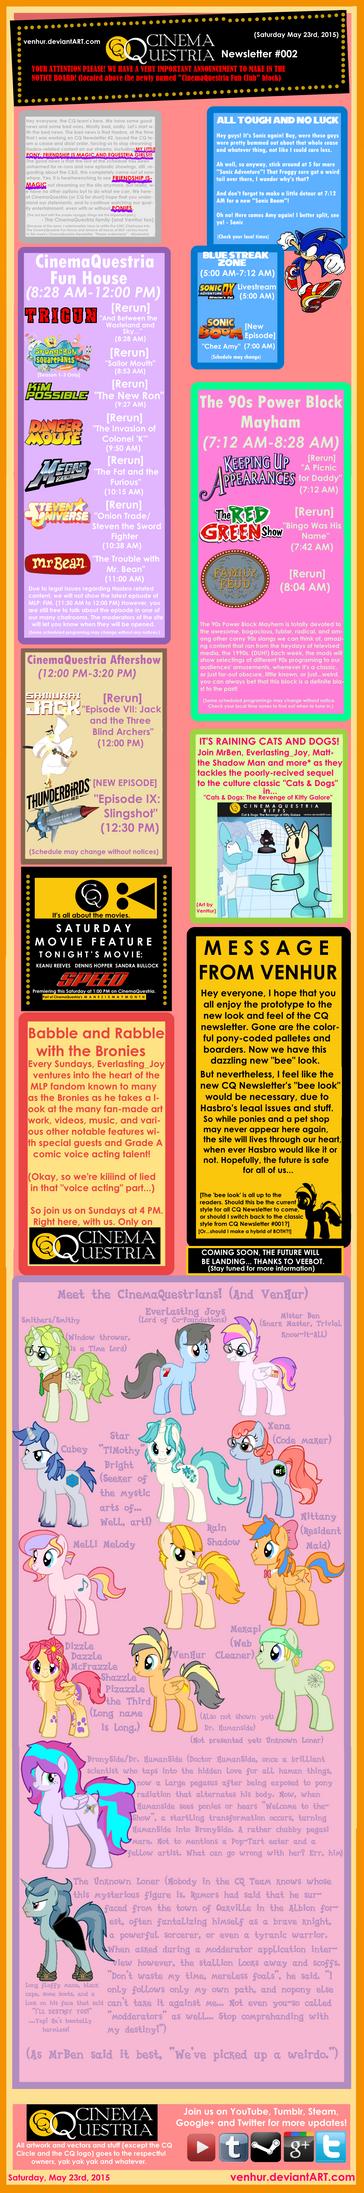 CinemaQuestria Newsletter Volume 2: May 23rd 2015 by VenHur